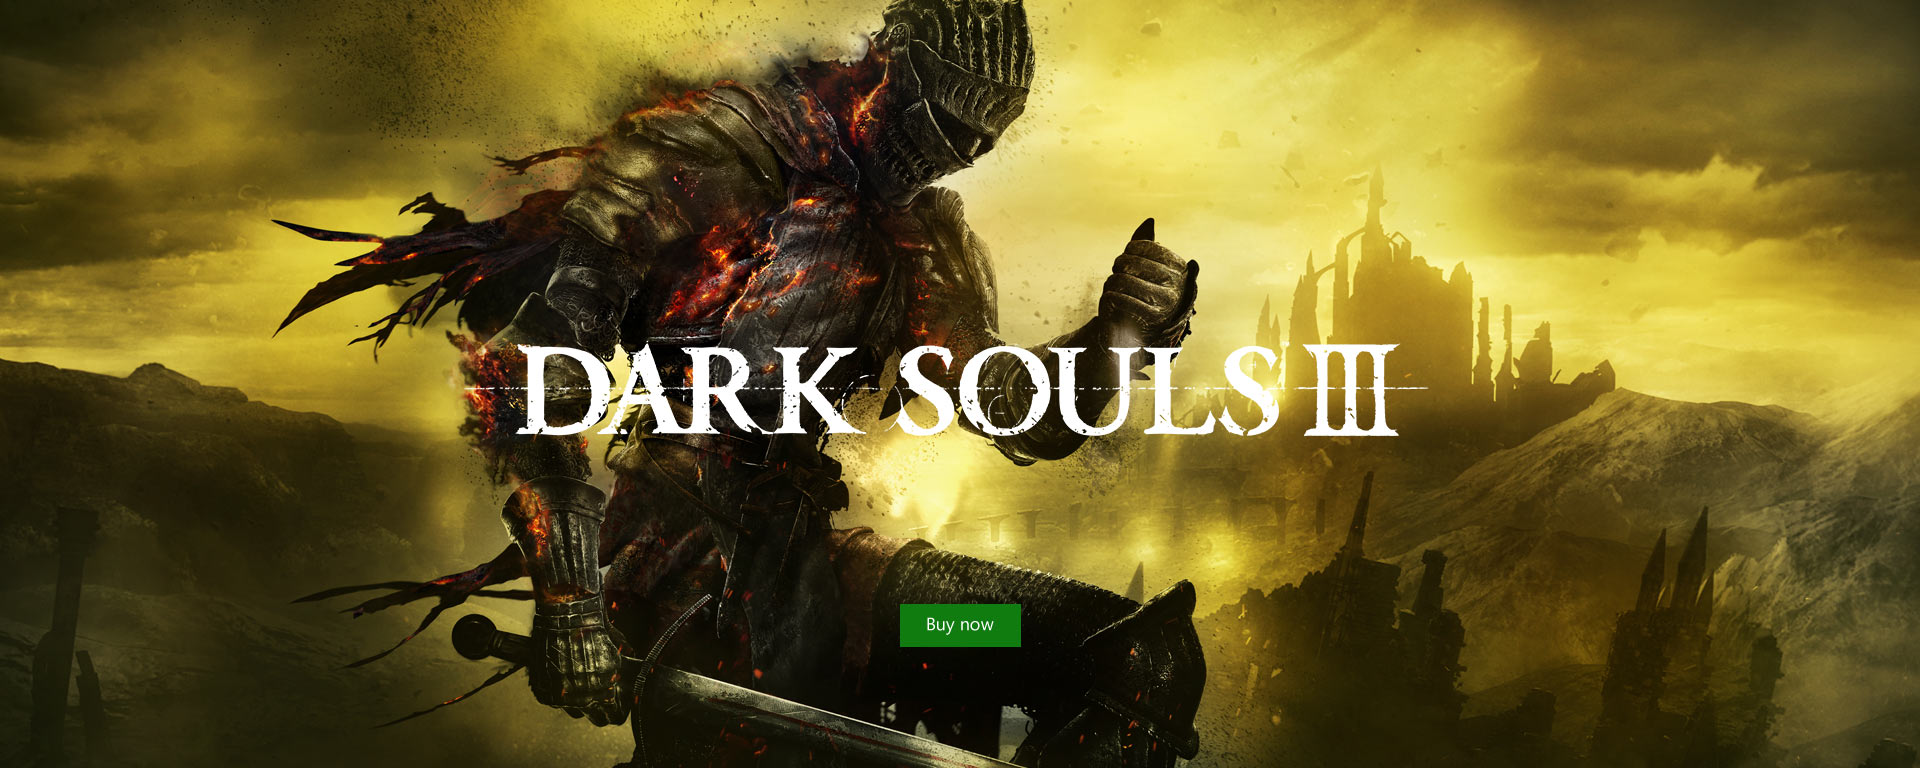 Dark Souls 3 on Xbox One